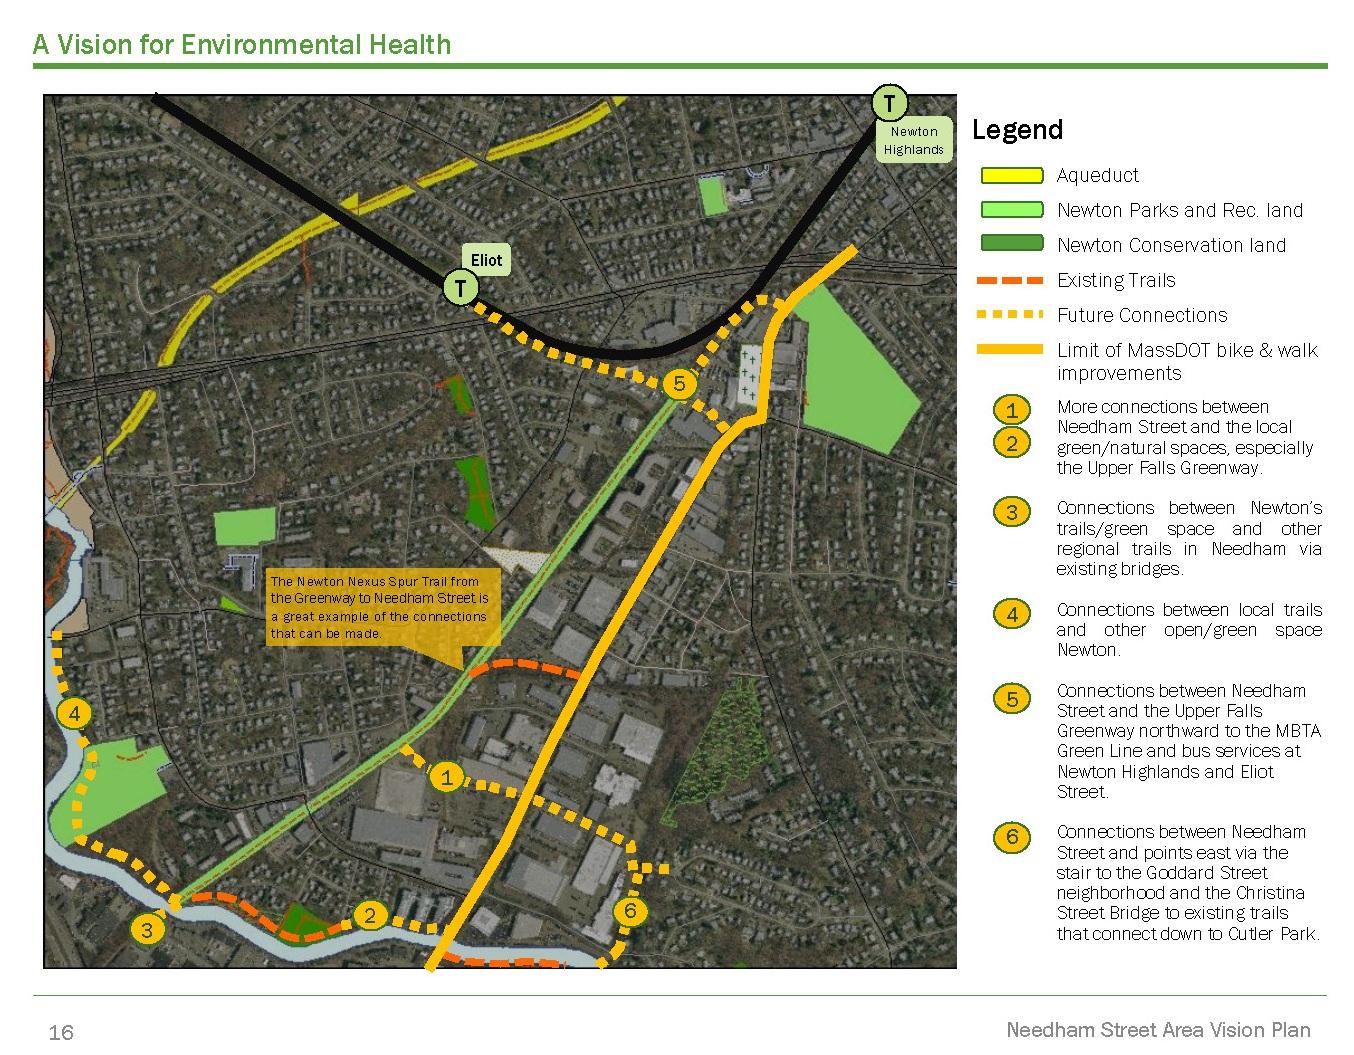 Needham Street Area Vision Plan